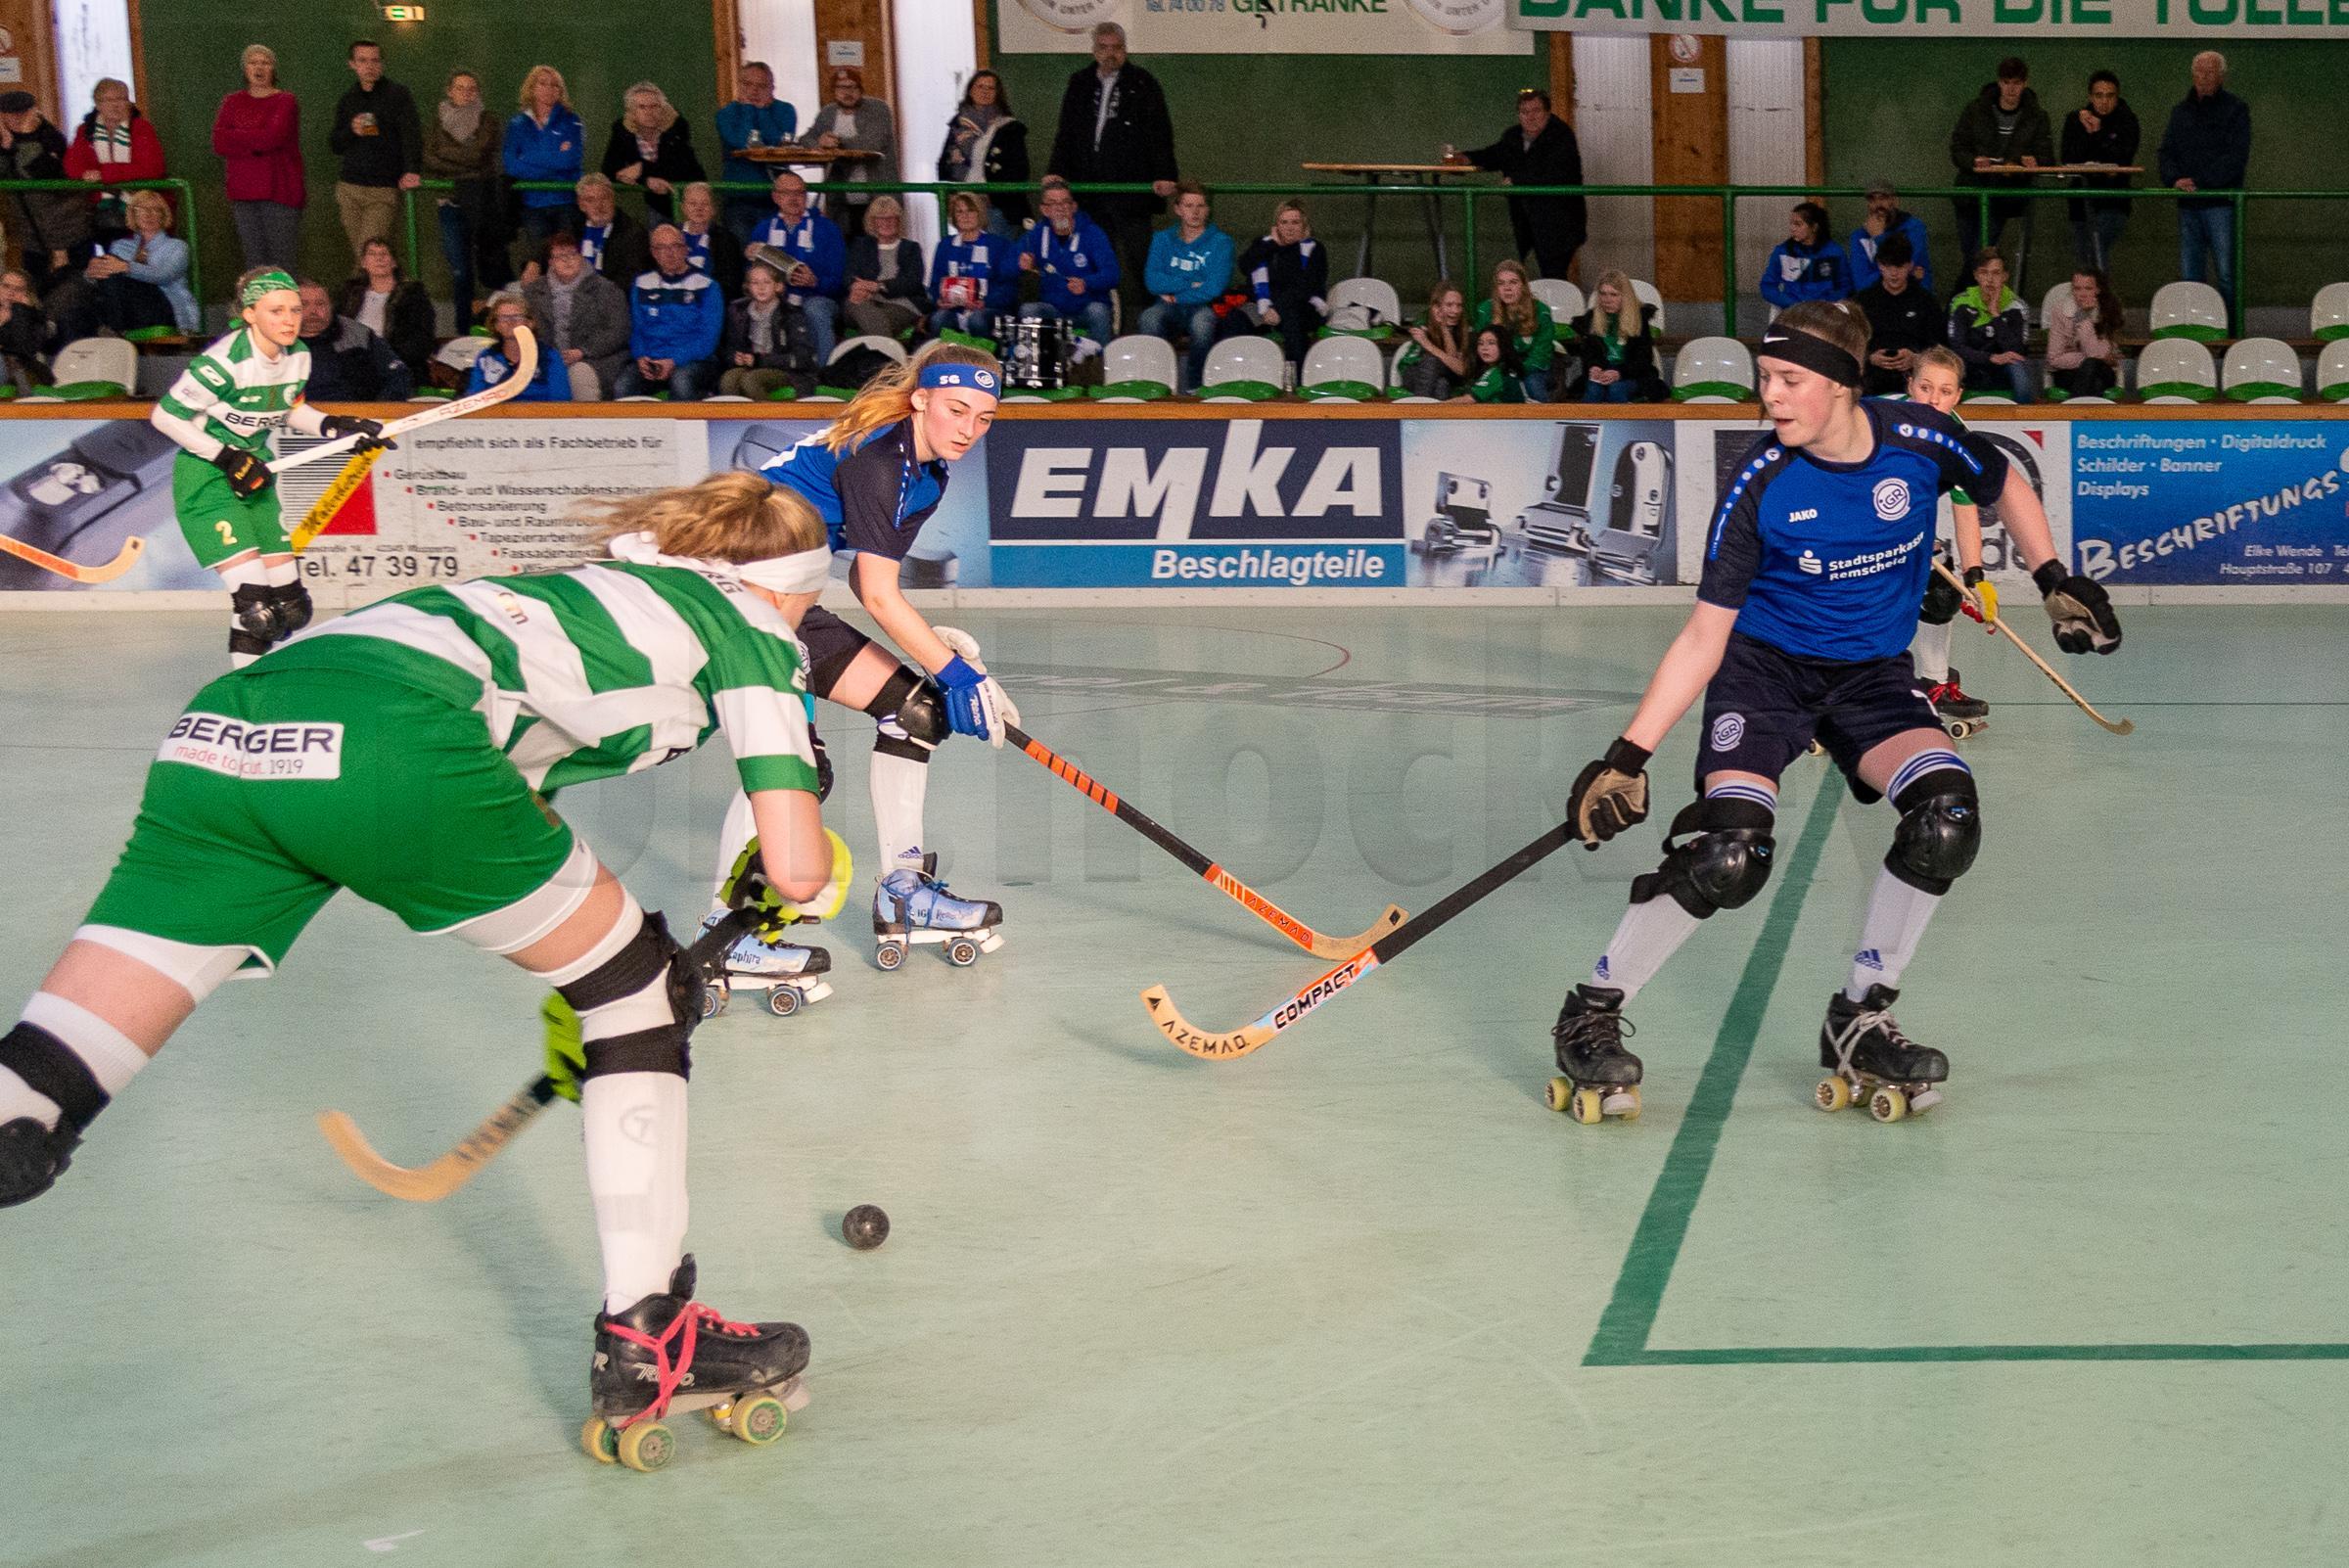 RSC Cronenberg Rollhockey Bundesliga Damen Play-Off-Halbfinale 13.04.2019